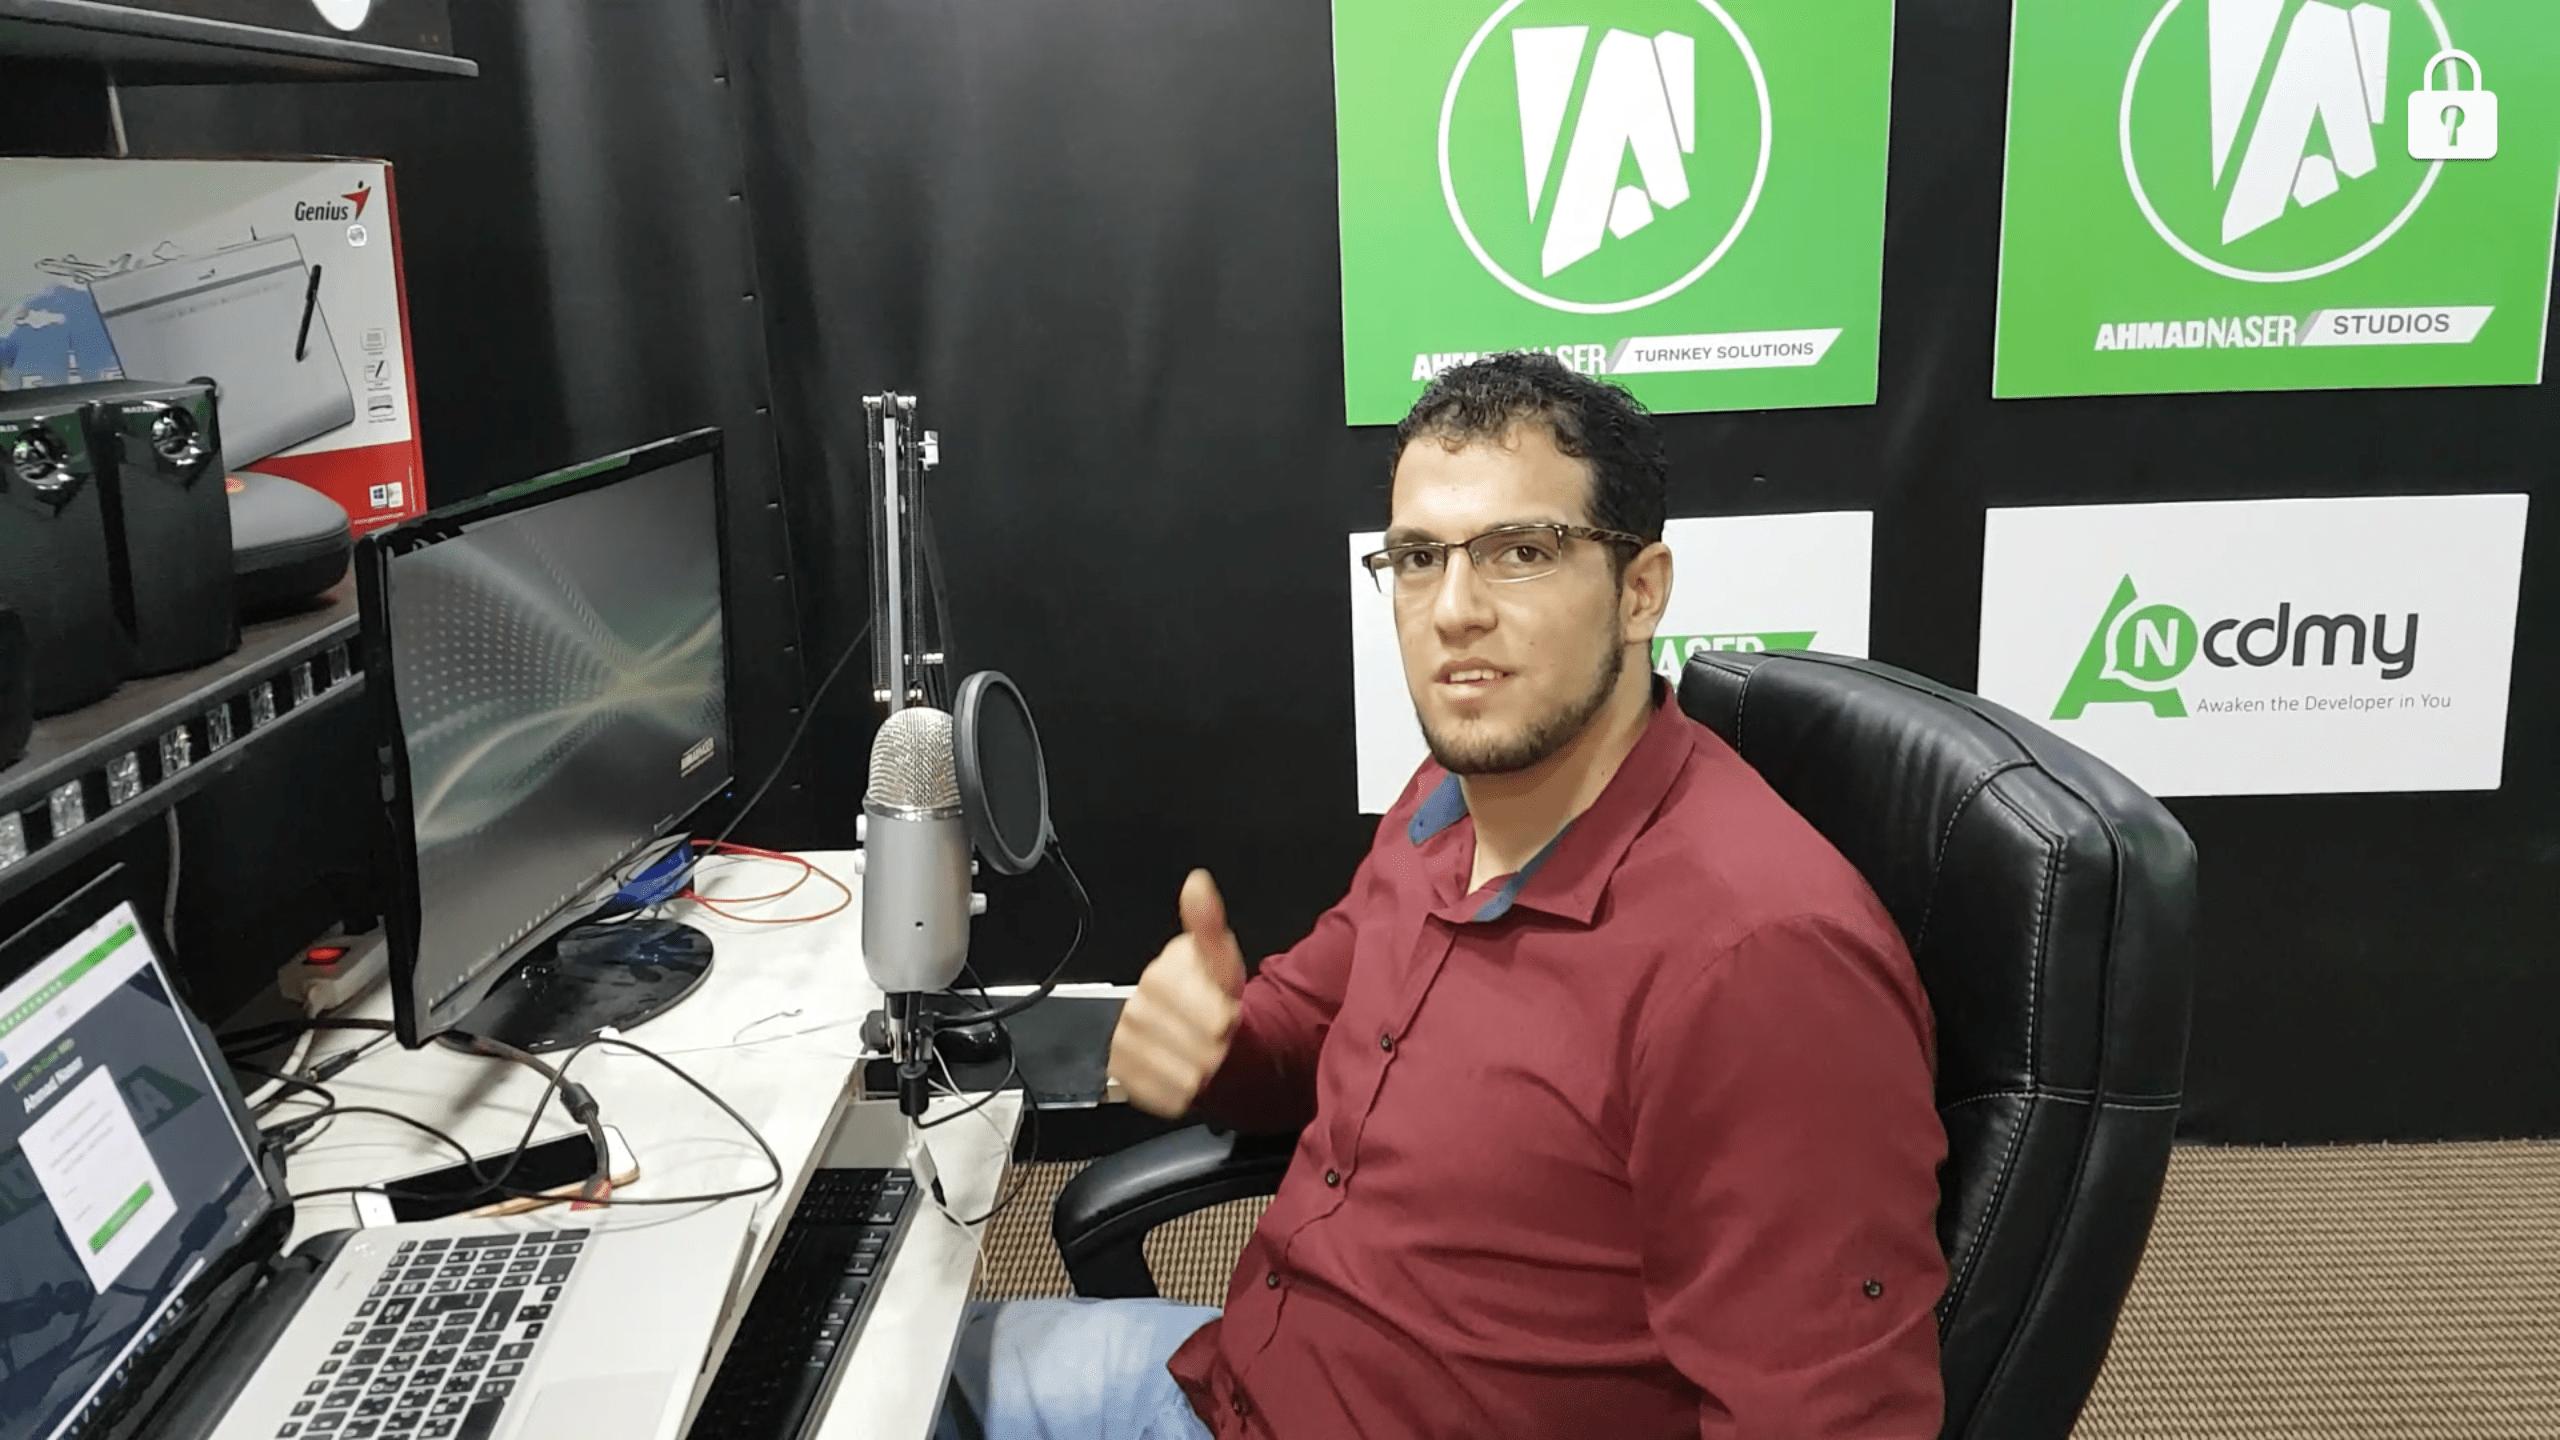 Photo of استوديو شركة أحمد ناصر بالعربي استوديو تعليم البرمجة الاحترافية الاول